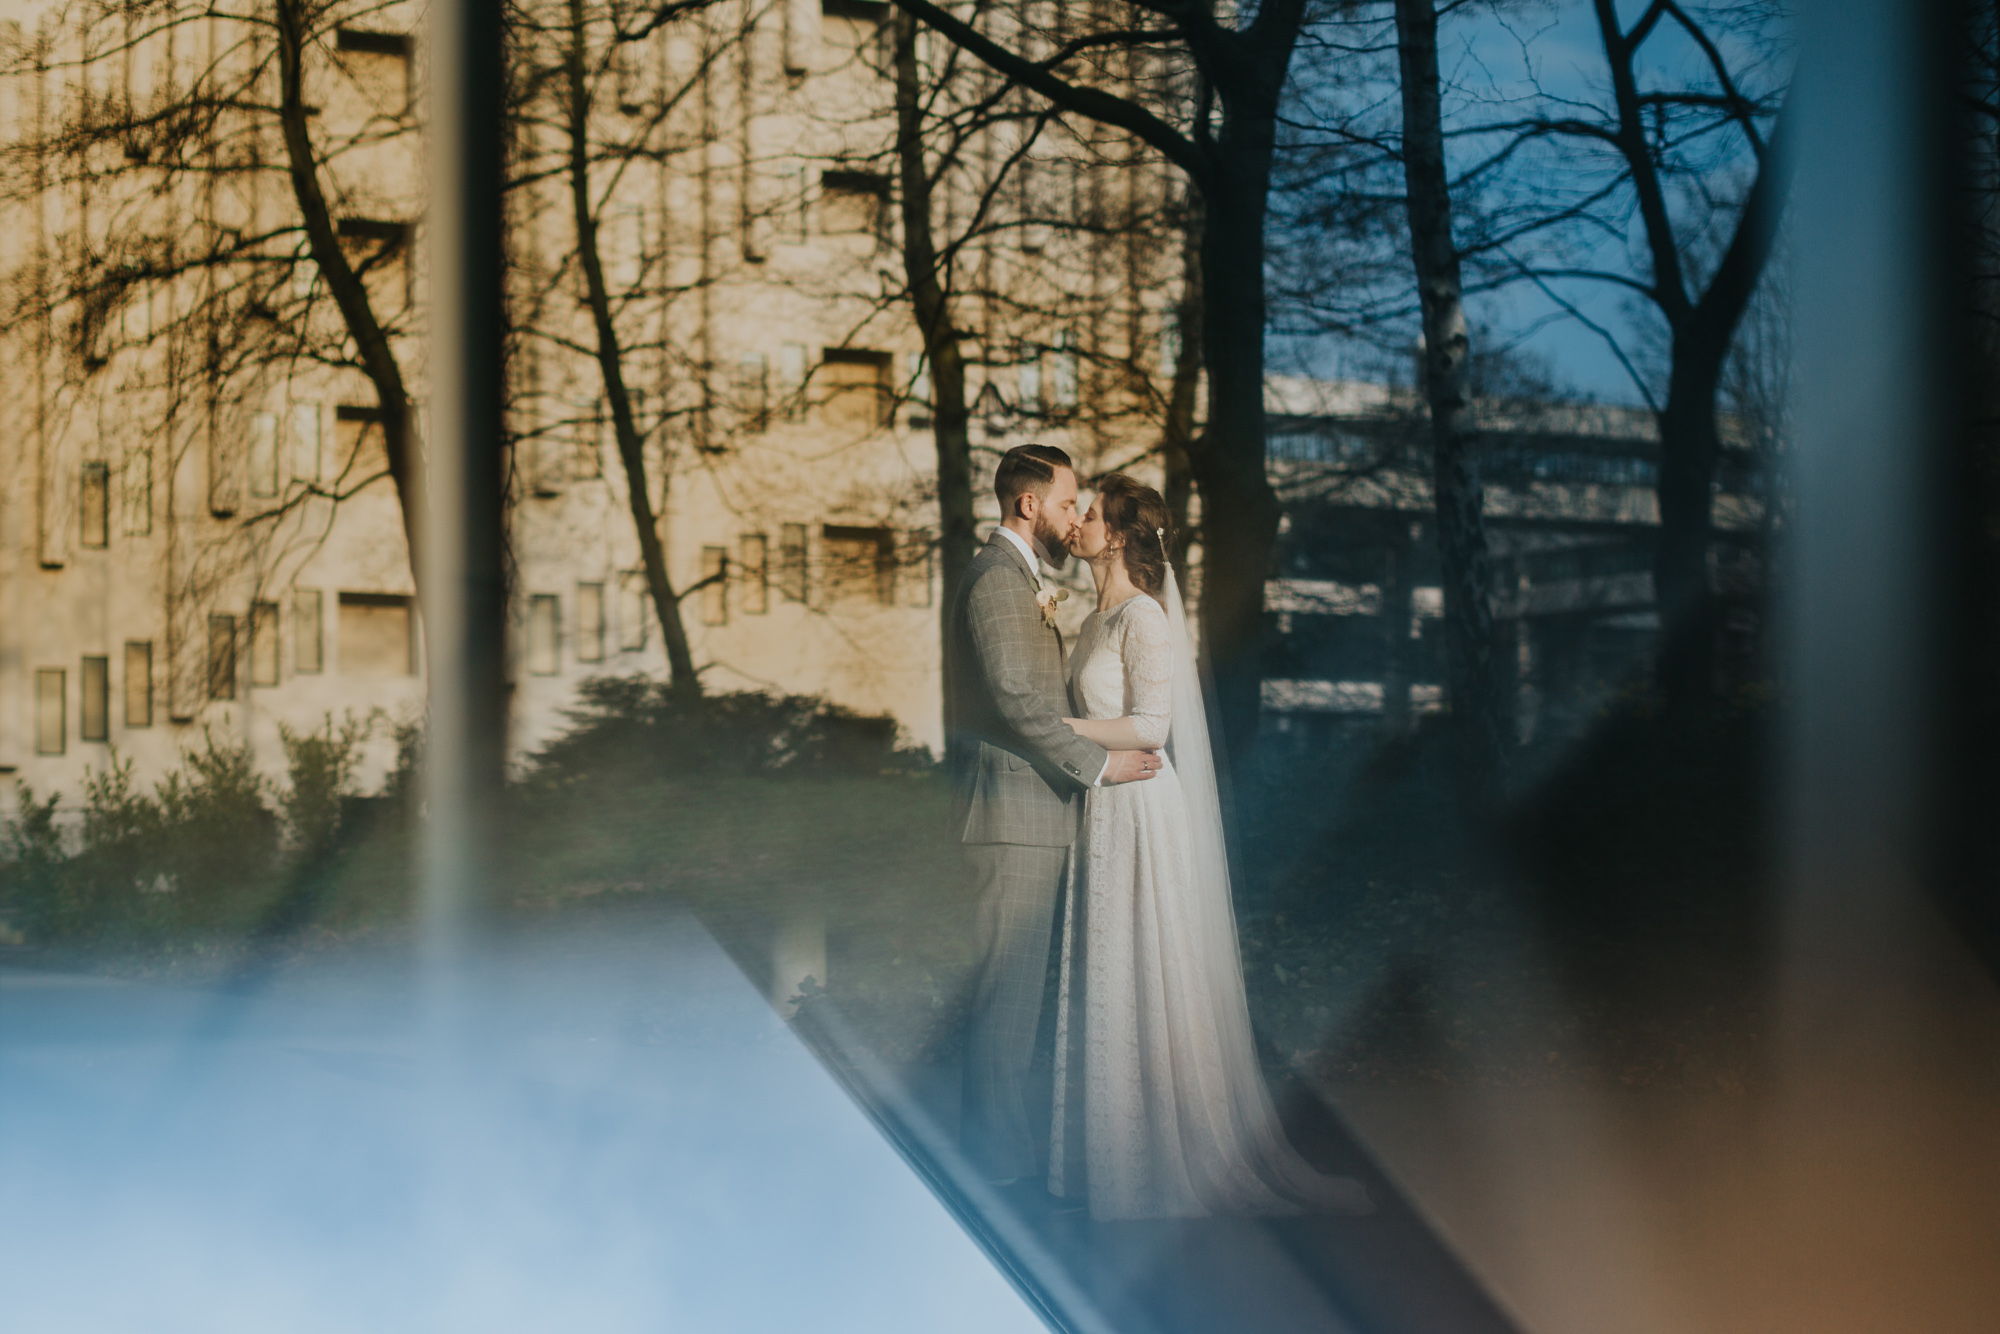 Kate-Beaumont-Lace-Flared-Dahlia-Gown-Leeds-Wedding-Bloom-Weddings-53.jpg